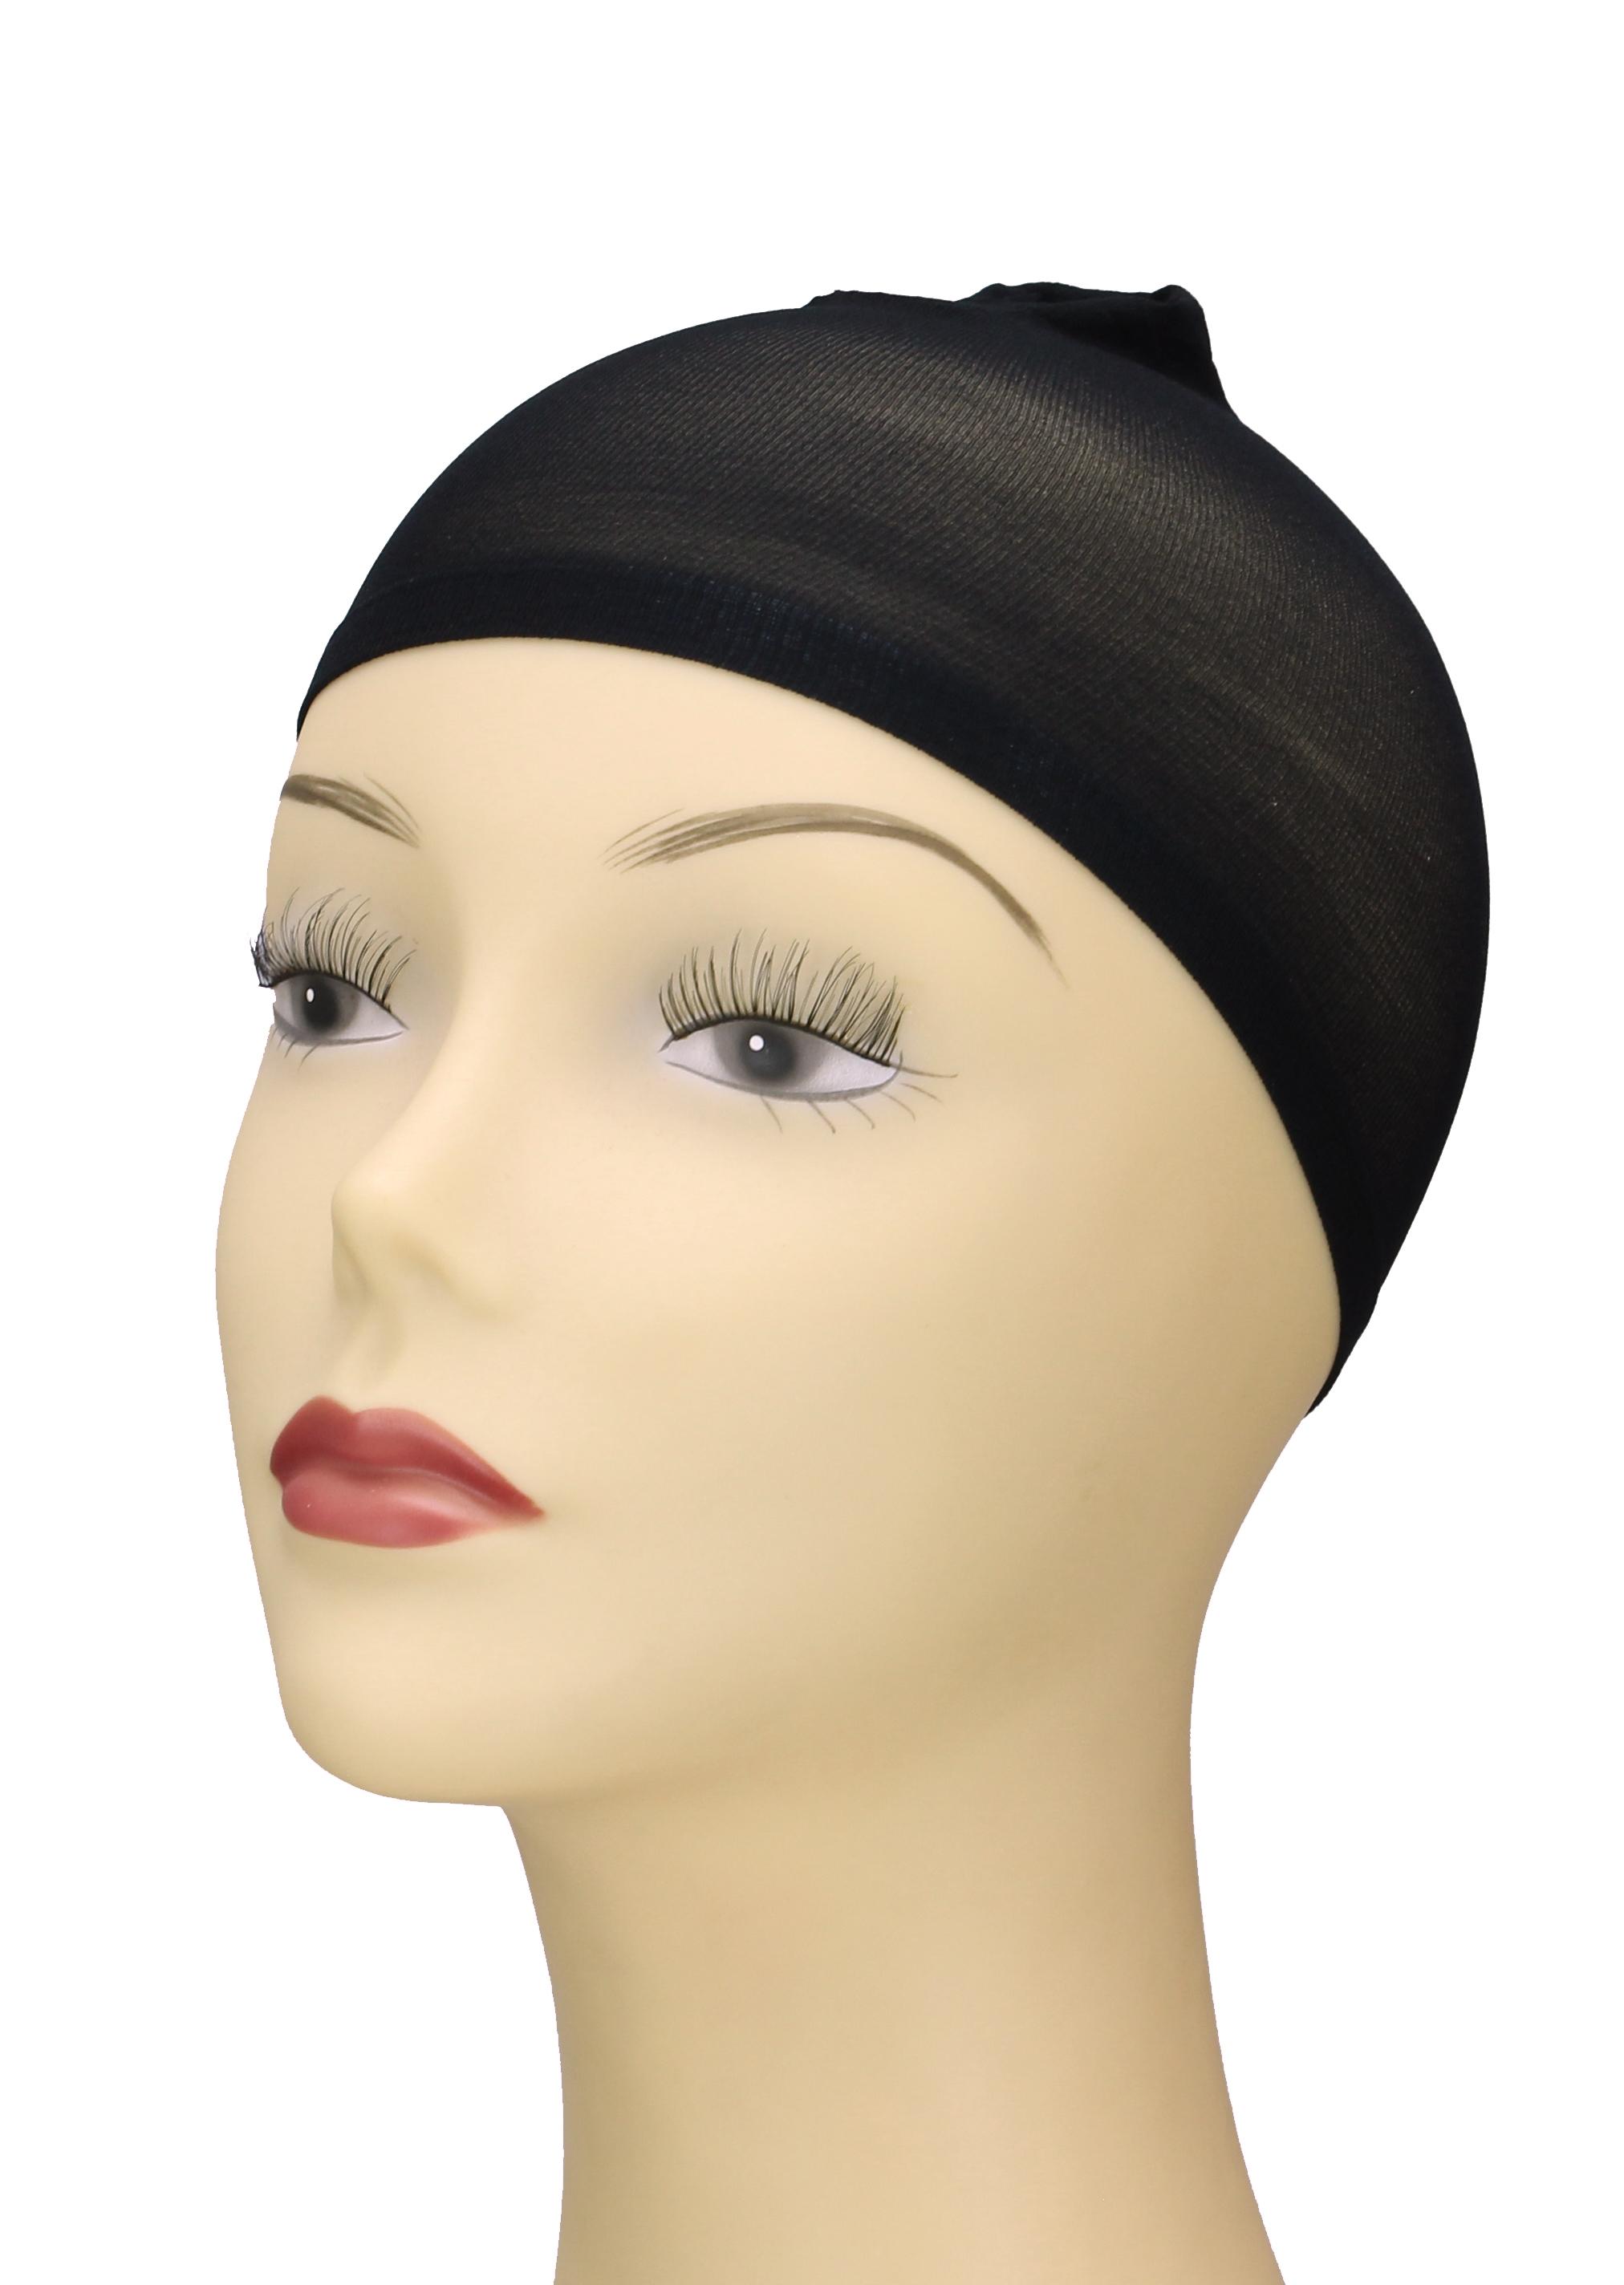 Standard wig cap janet 39 s closet for Porte 4 cap janet